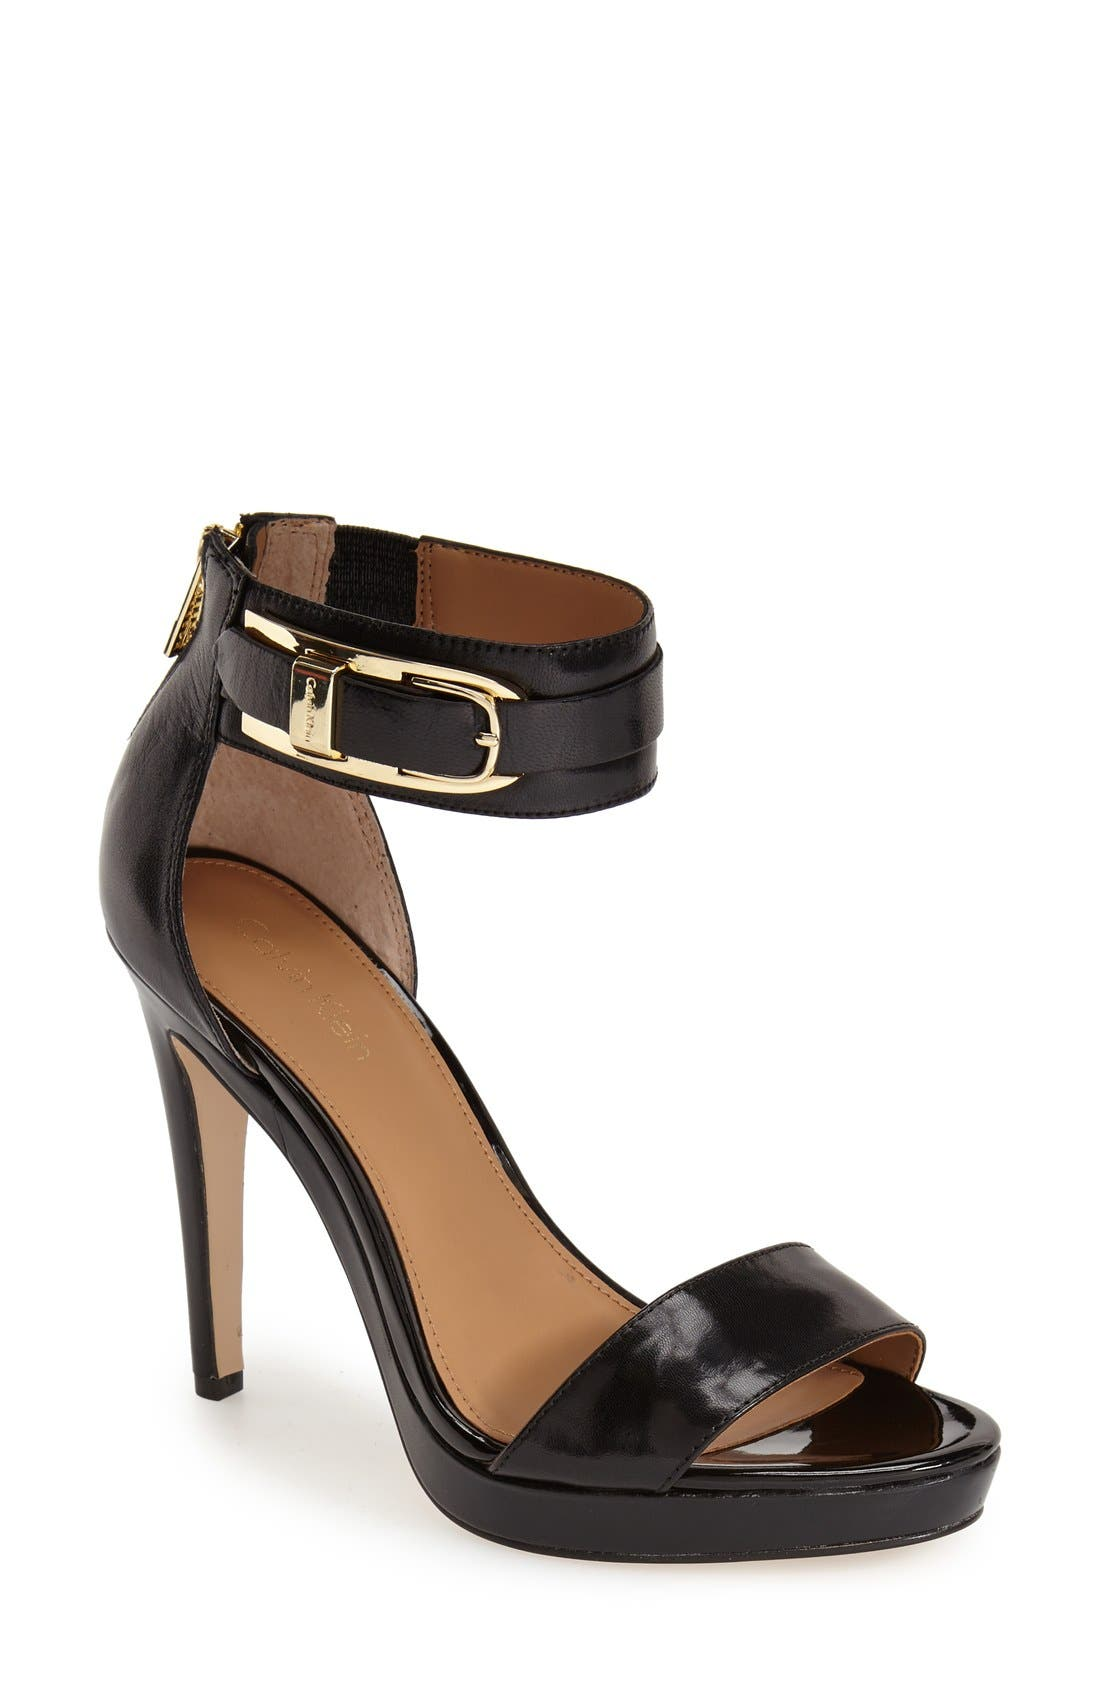 Main Image - Calvin Klein 'Panthea' Ankle Strap Sandal (Women)